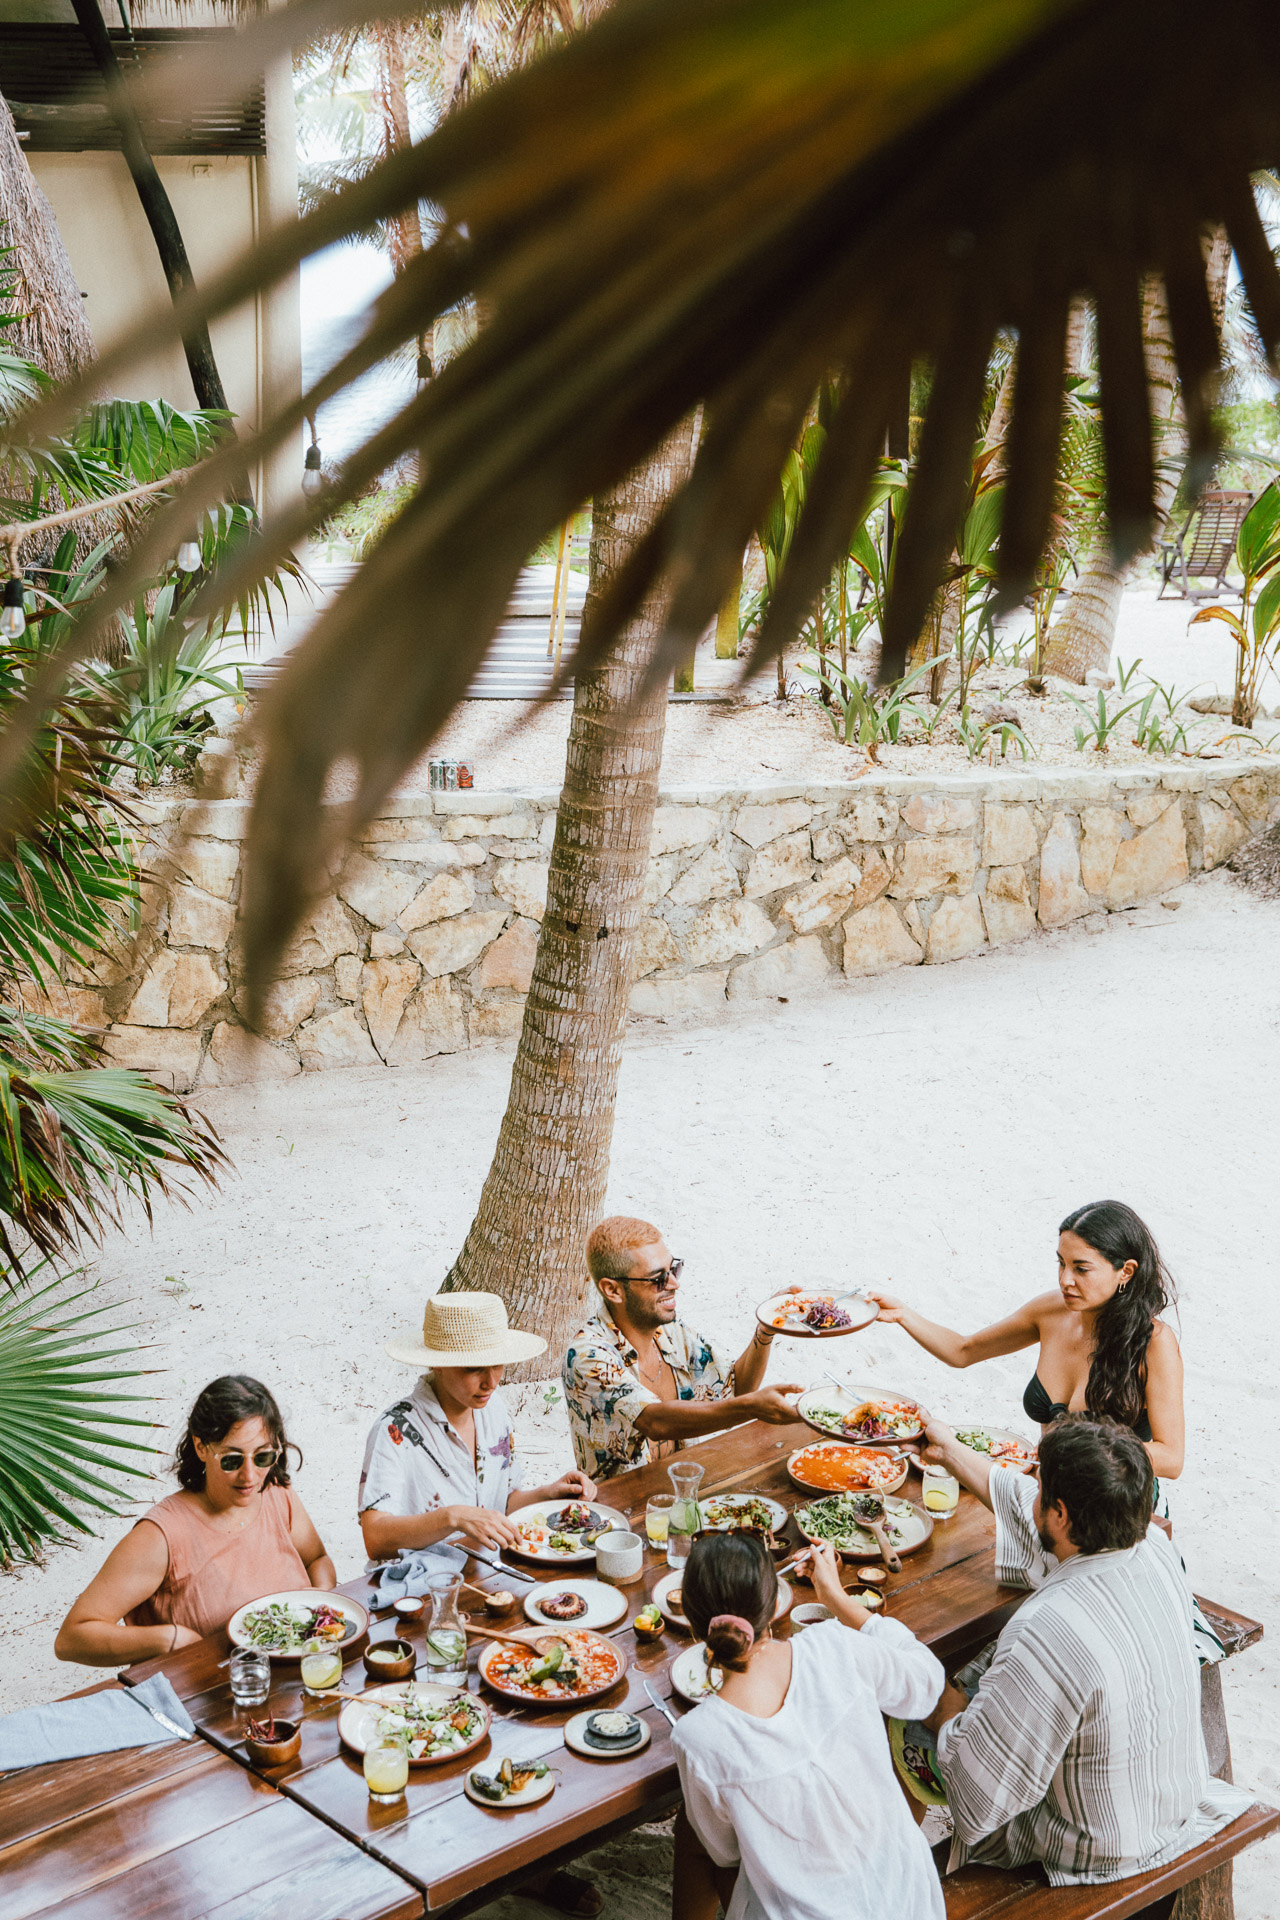 caribbean-hotel-resort-photographer-olas-tulum-mexico-2848.jpg